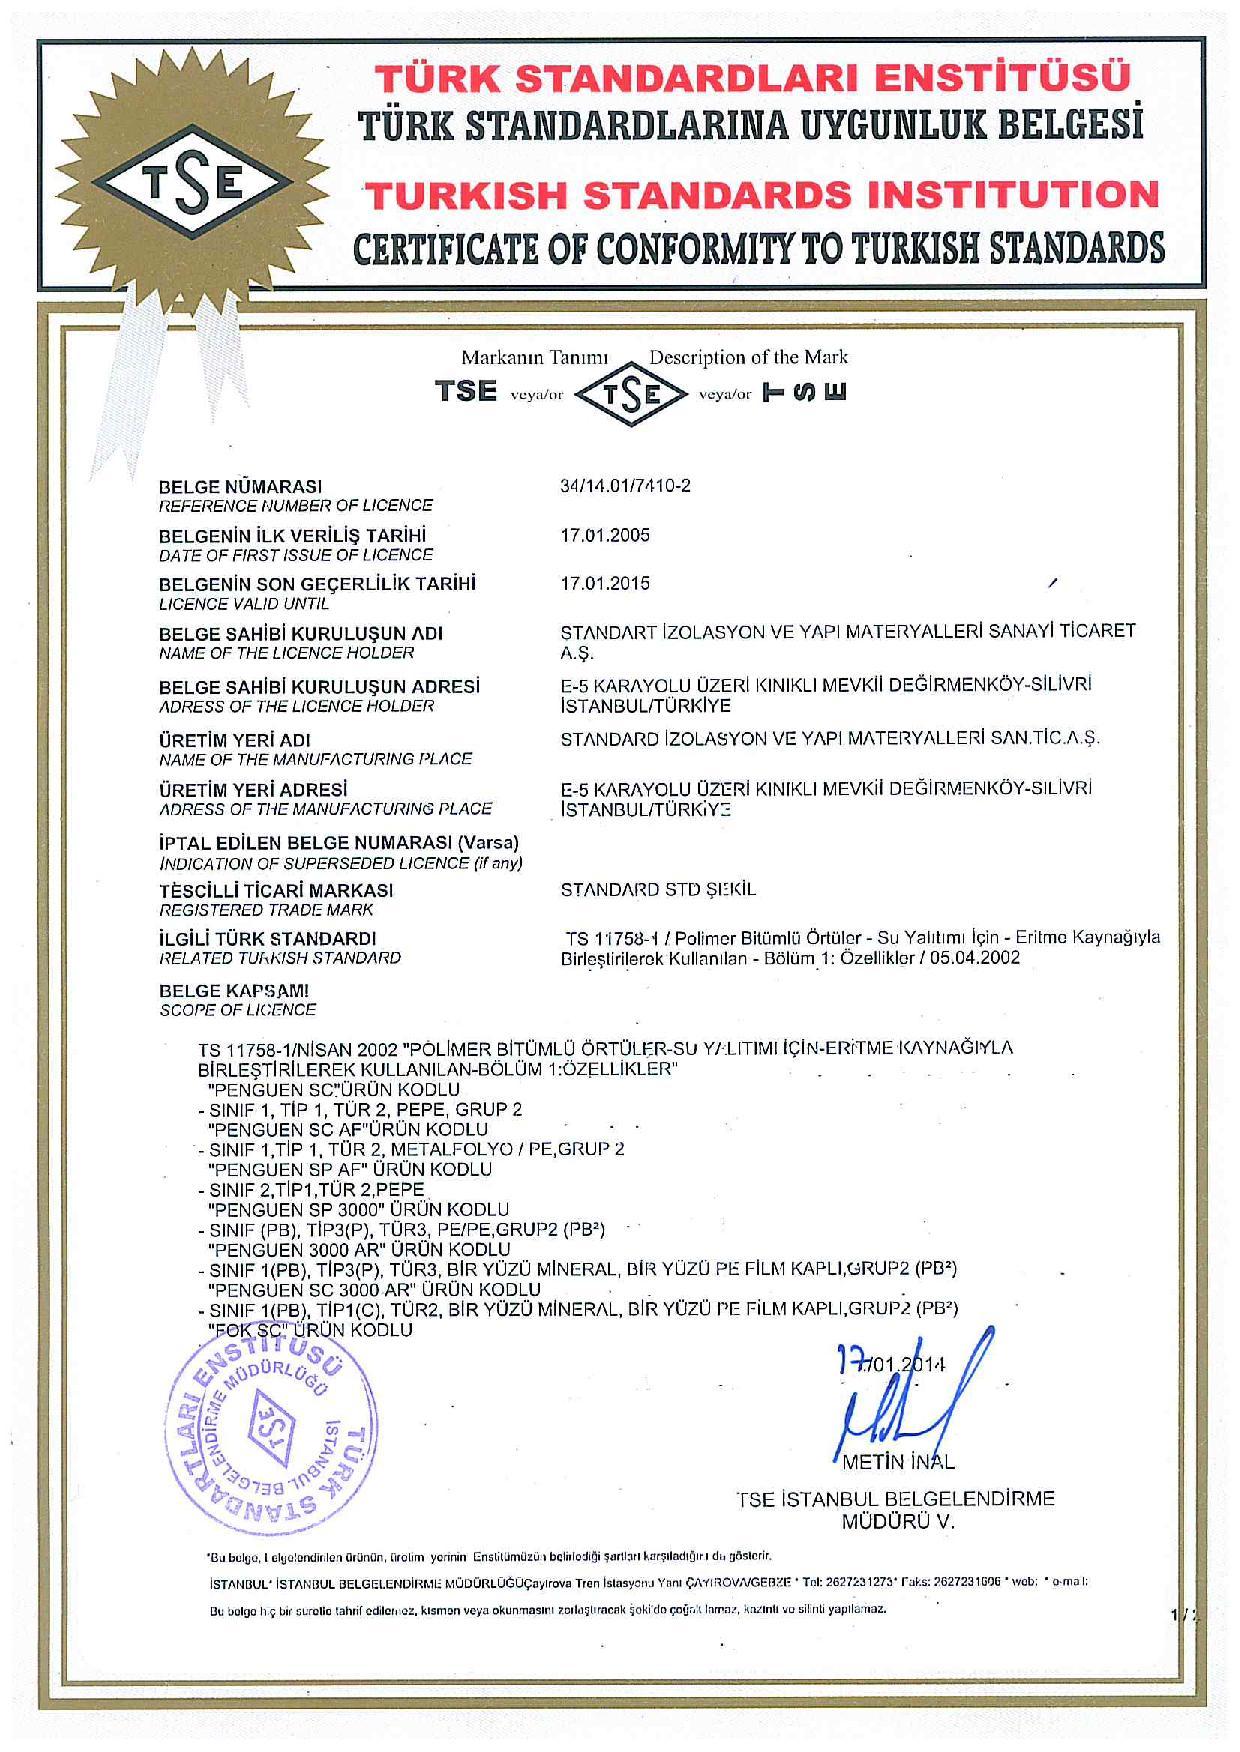 Penguen Alüminyum Folyolu SP3000 AF (3mm)-5829